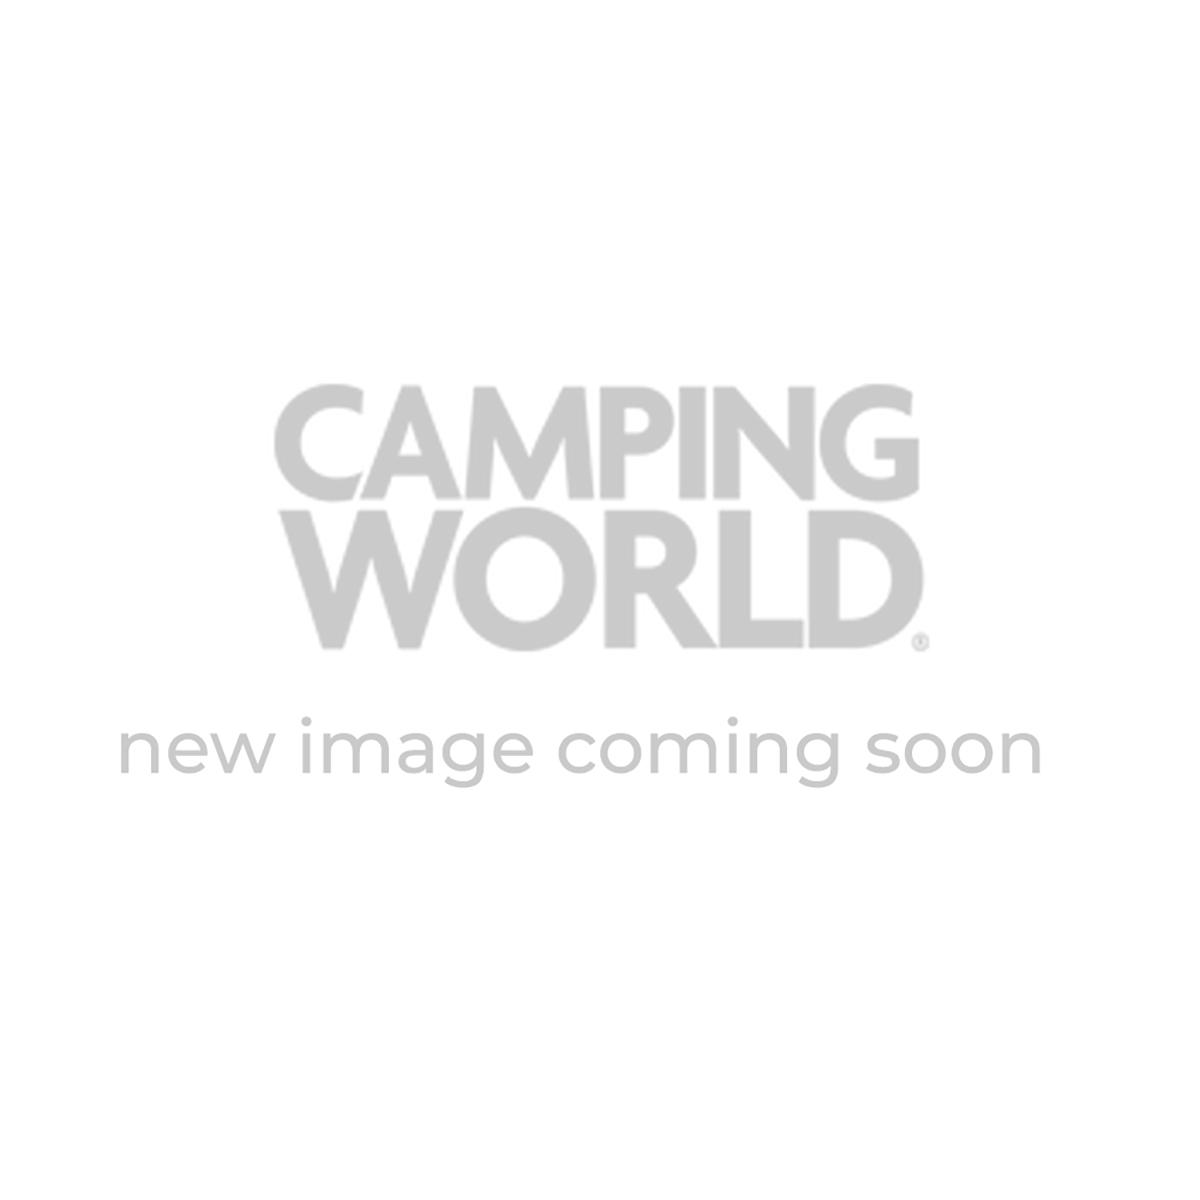 noimagelarge